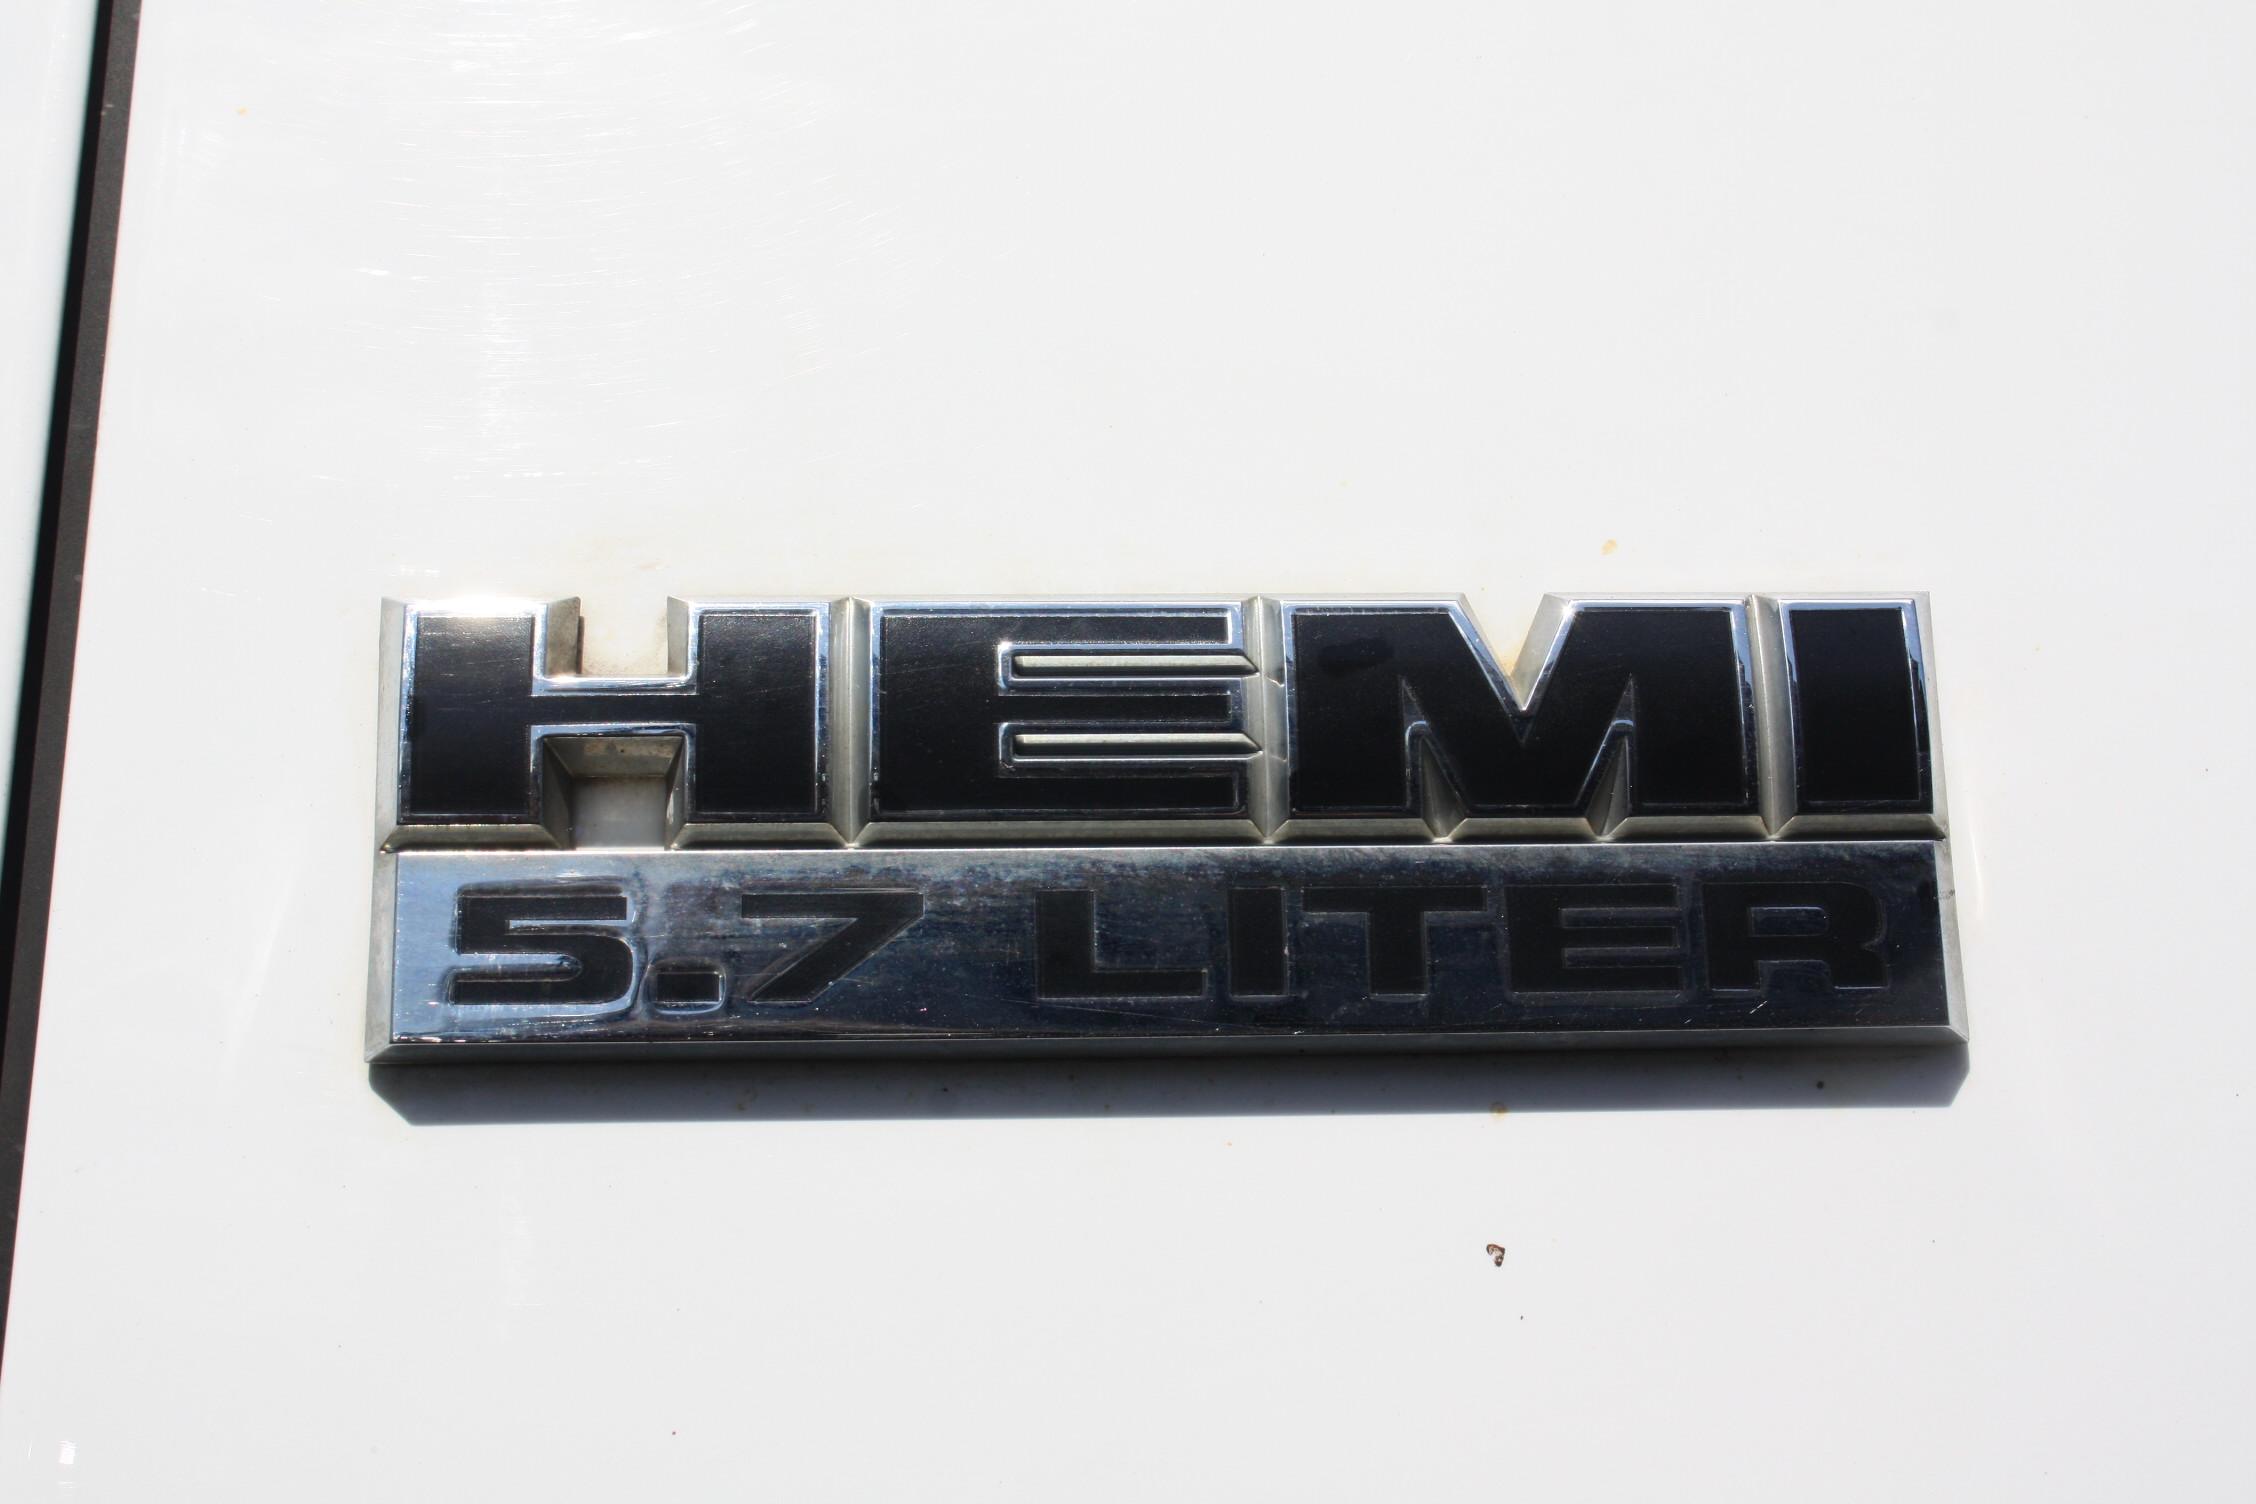 IMG 3020 - 2010 DODGE RAM 2500HD KNAPHEIDE UTILITY TRUCK